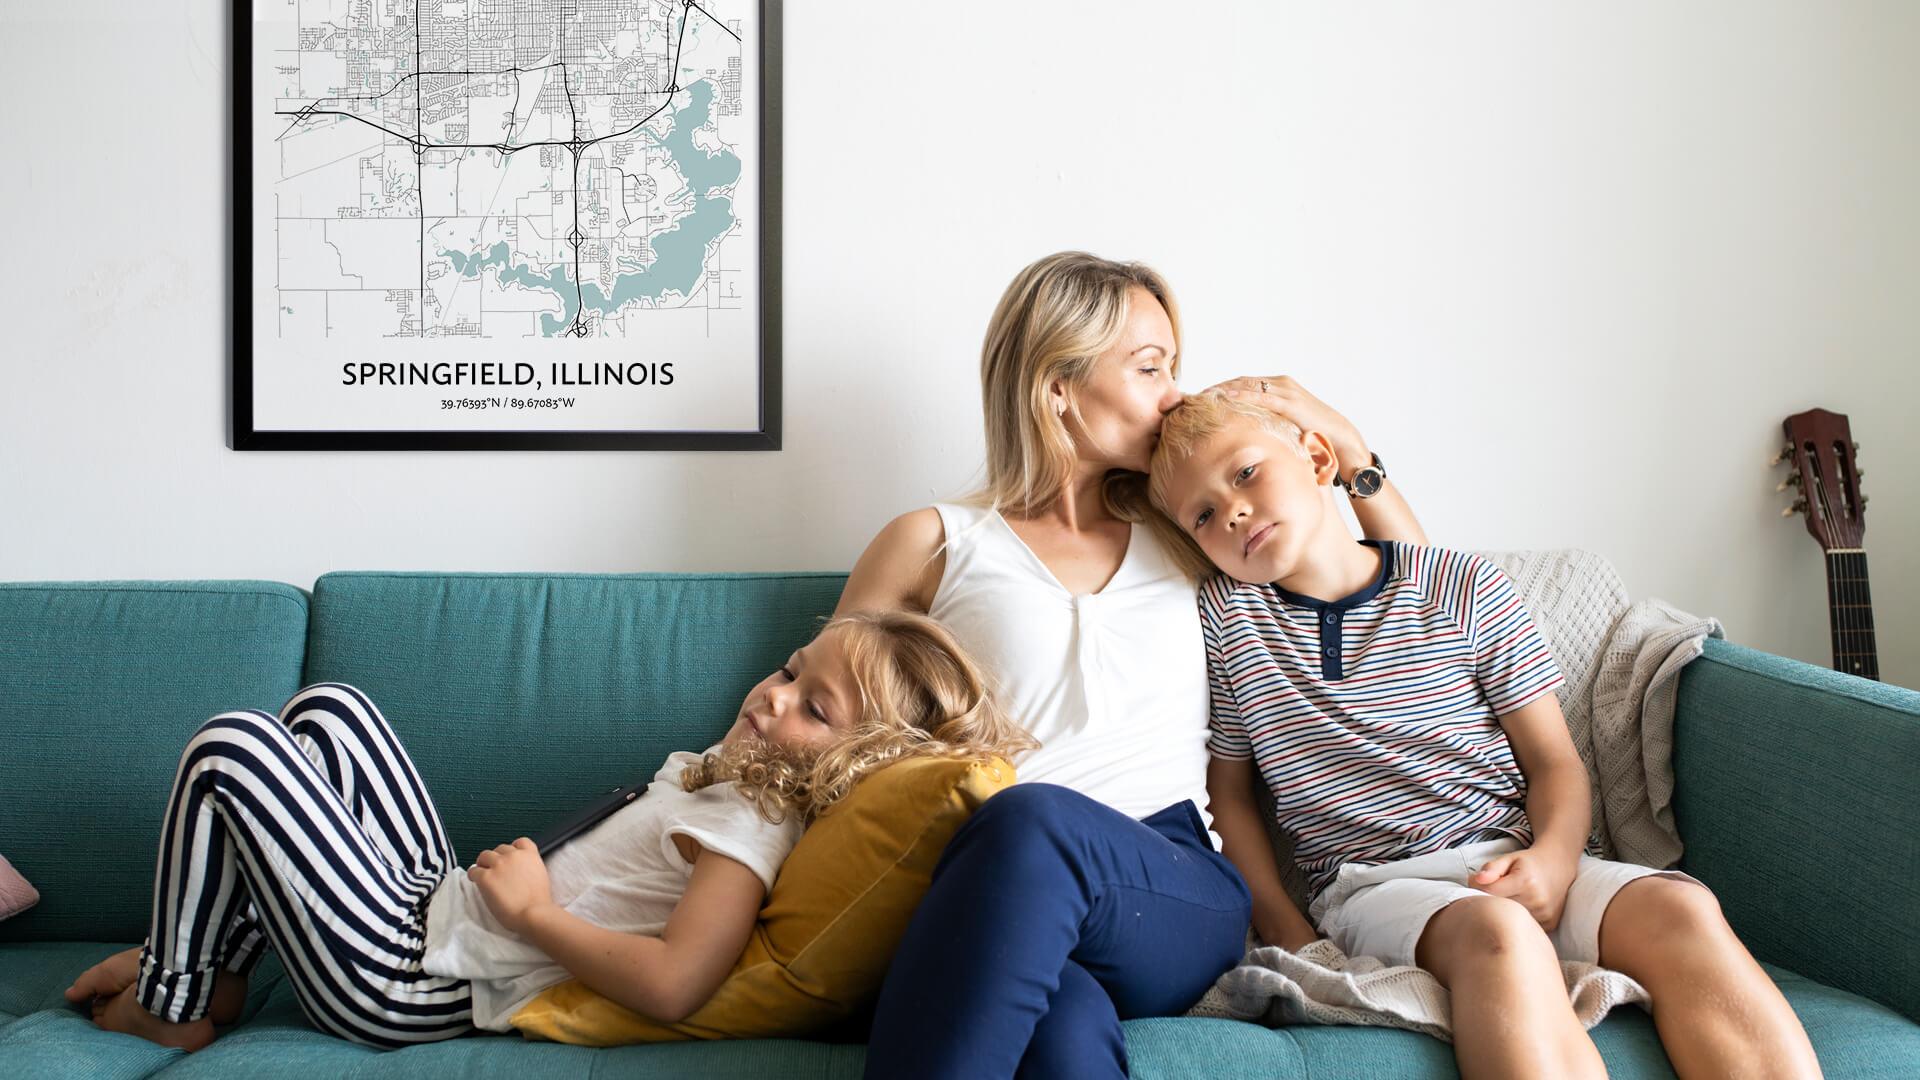 Springfield Illinois map poster